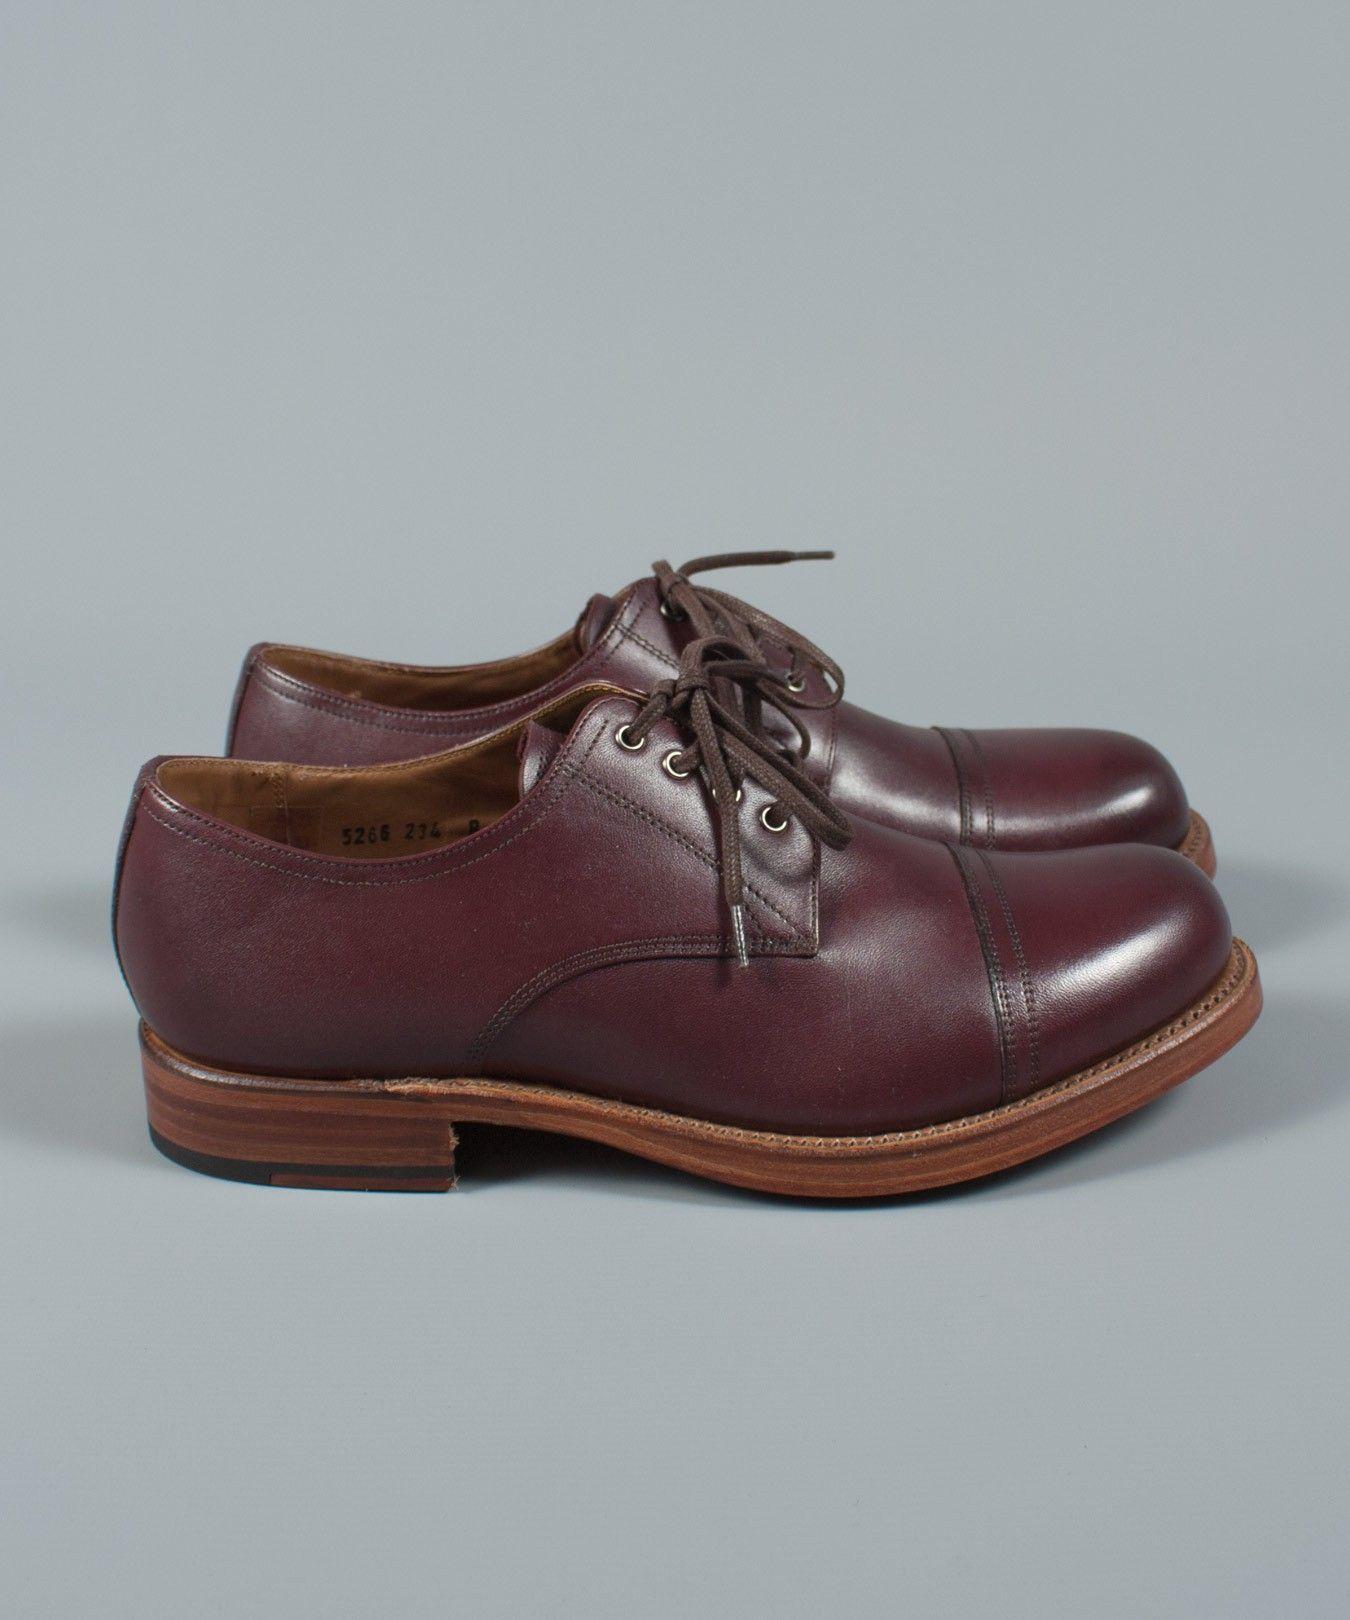 Grenson at Weavers Door | Grenson Shoes AW13 | Rhys | Burgundy | £205.00 & Grenson at Weavers Door | Grenson Shoes AW13 | Rhys | Burgundy ...